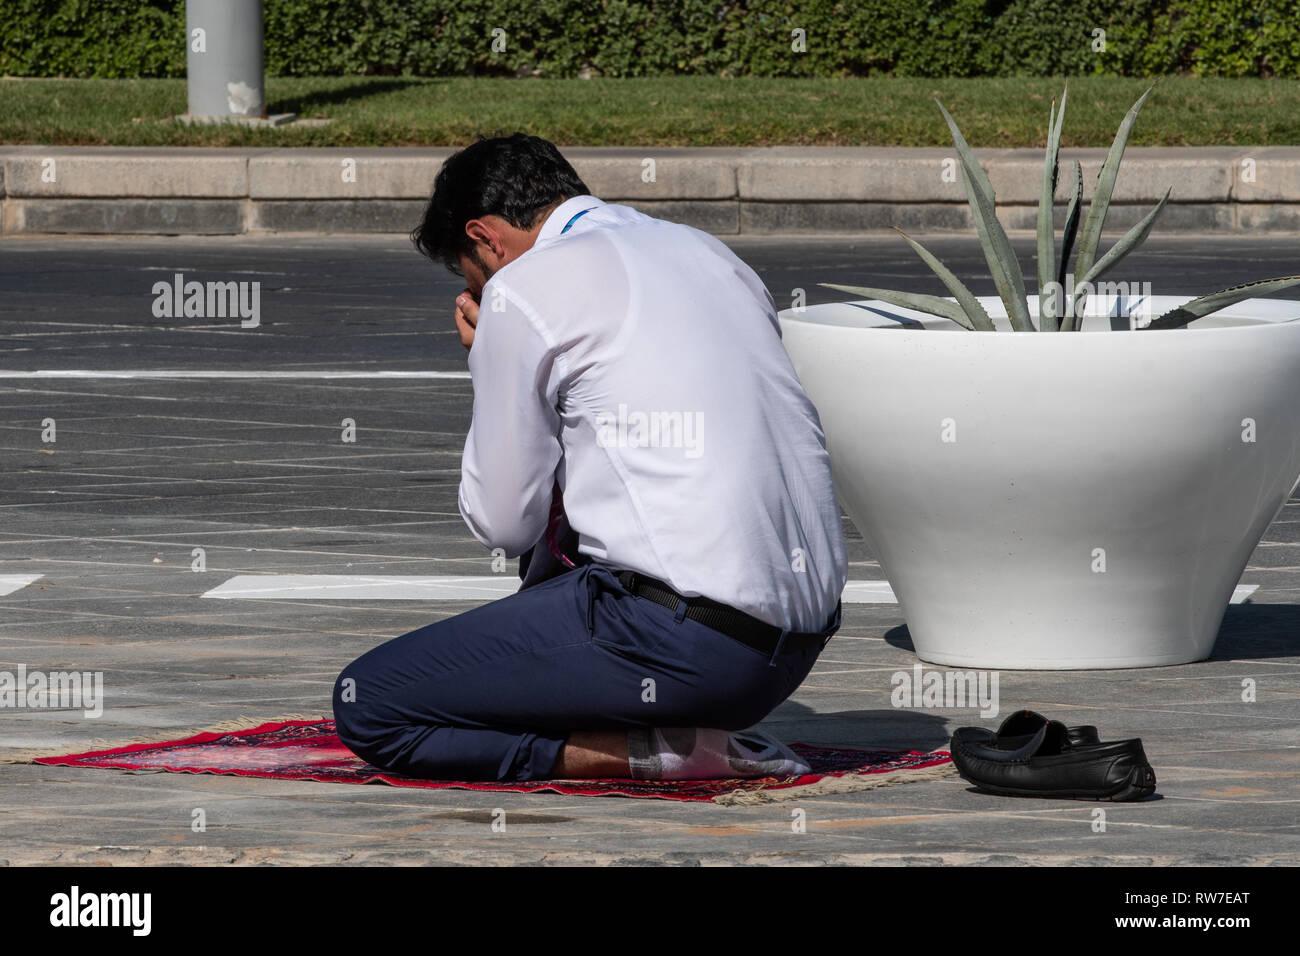 ABU DHABI, UNITED ARAB EMIRATES - 2018/12/01 - Muslim man praying in the middle of the street in Abu Dhabi. - Stock Image